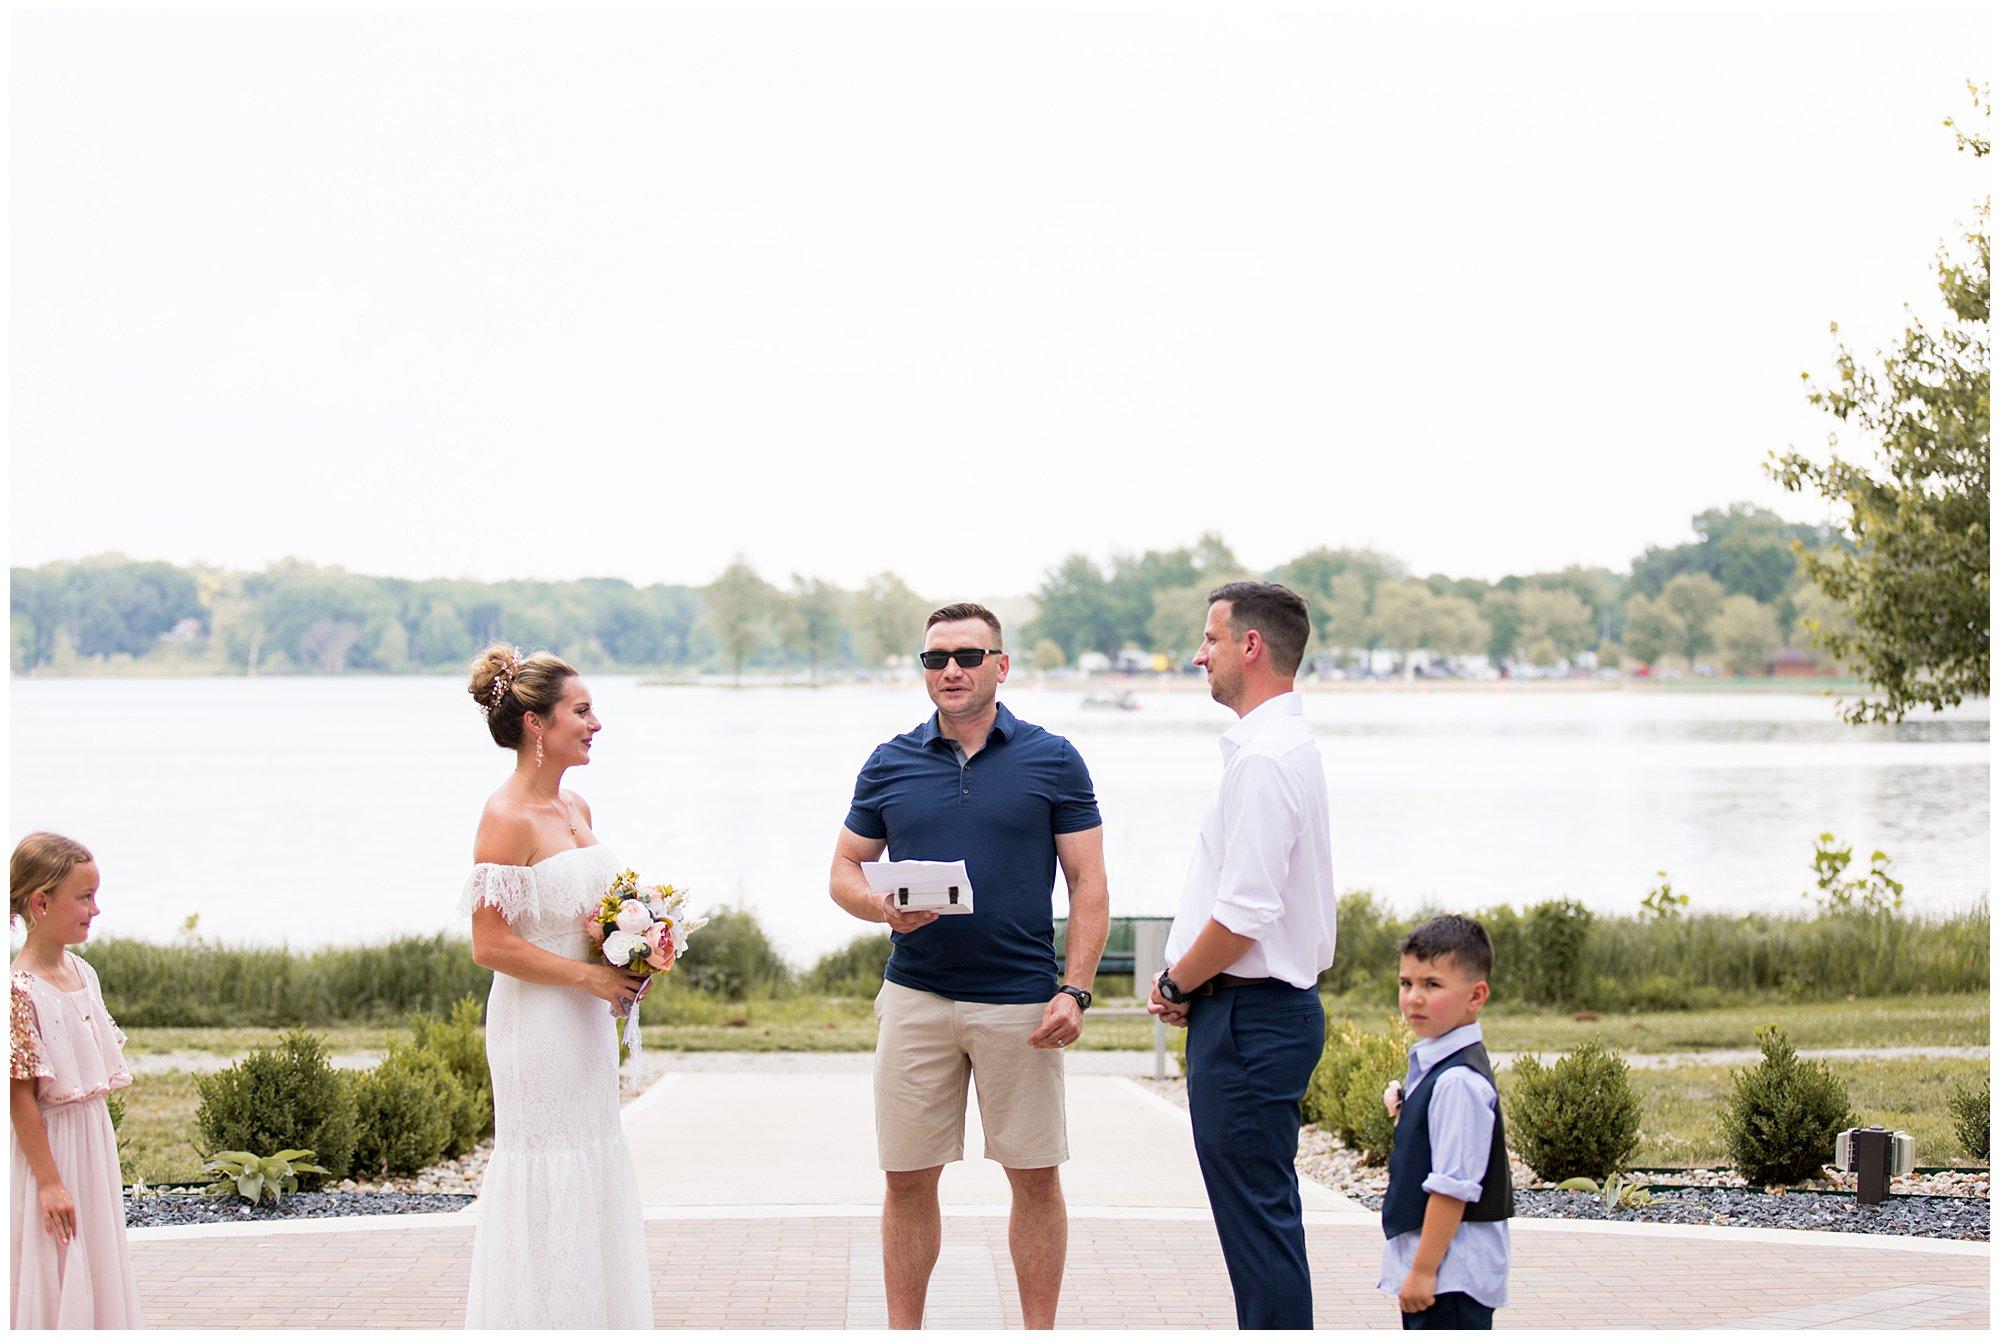 Wedding Ceremony at Lucerne Park in Warsaw, Indiana